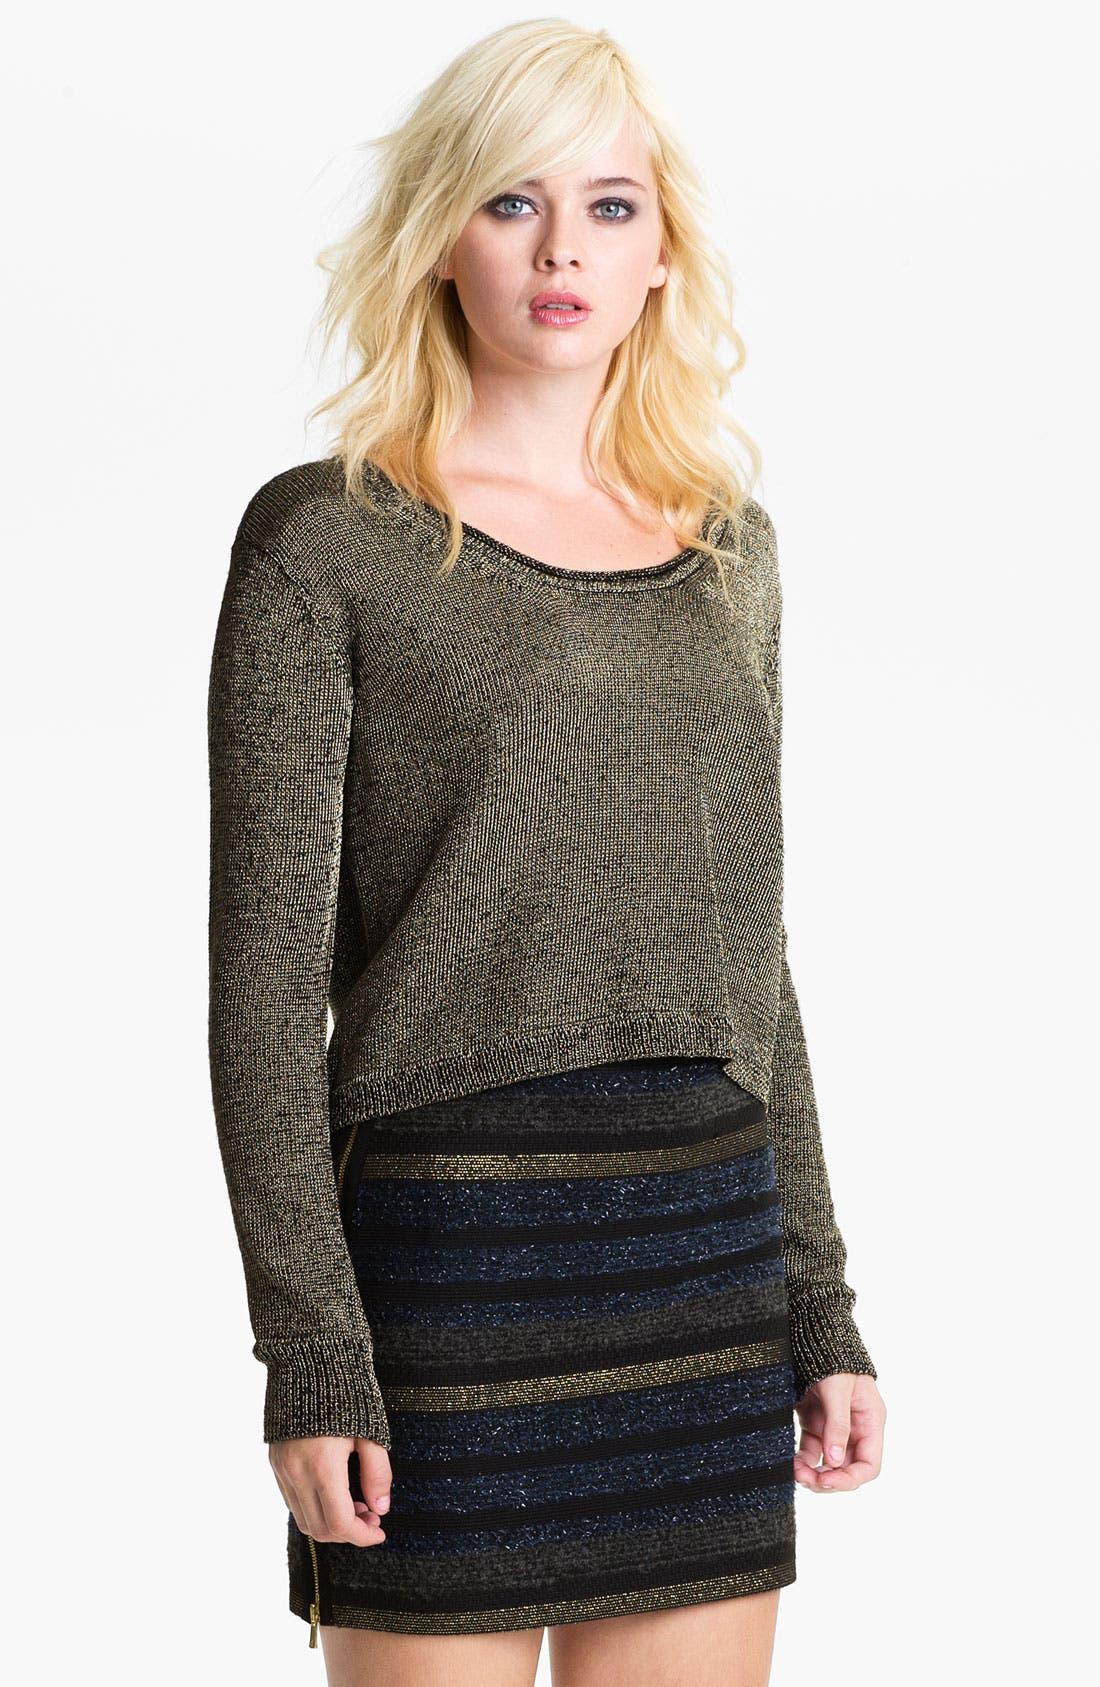 Alternate Image 1 Selected - Rebecca Minkoff 'Ellen' Metallic Sweater